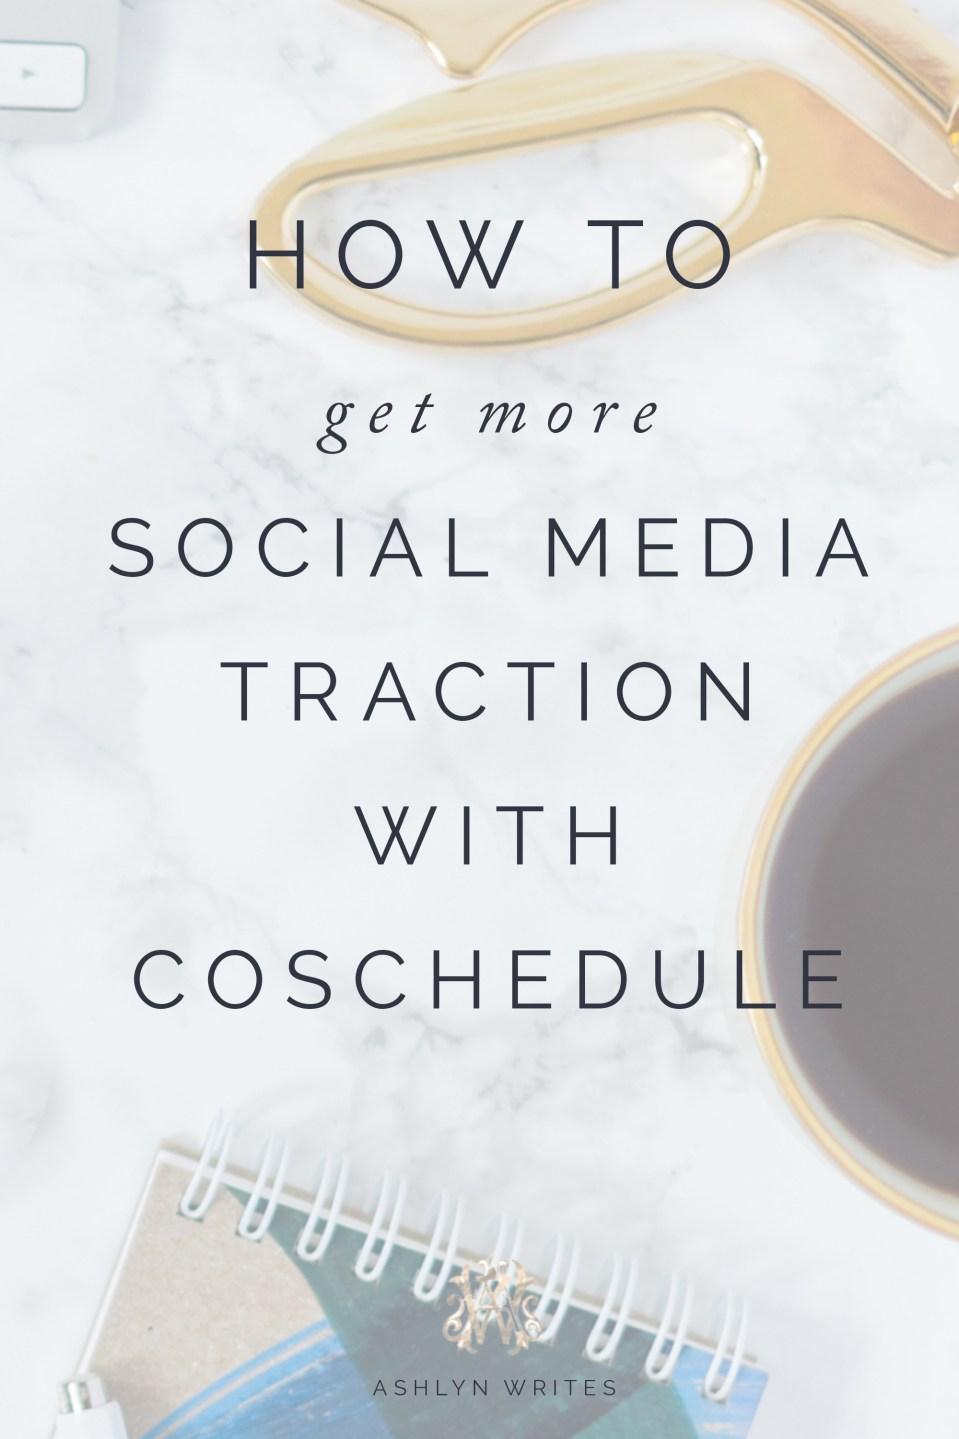 Coschedule social media tips